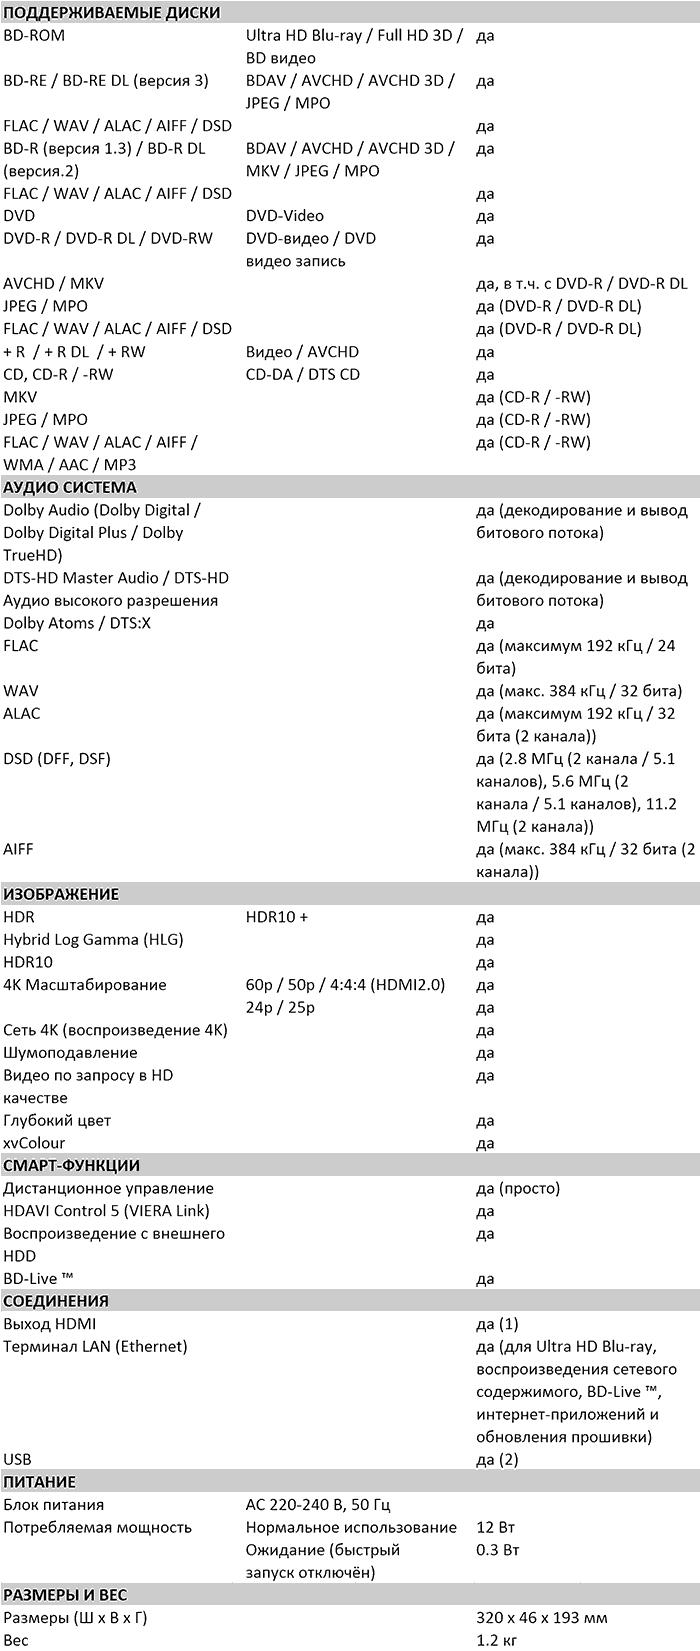 Характеристики DP-UB150